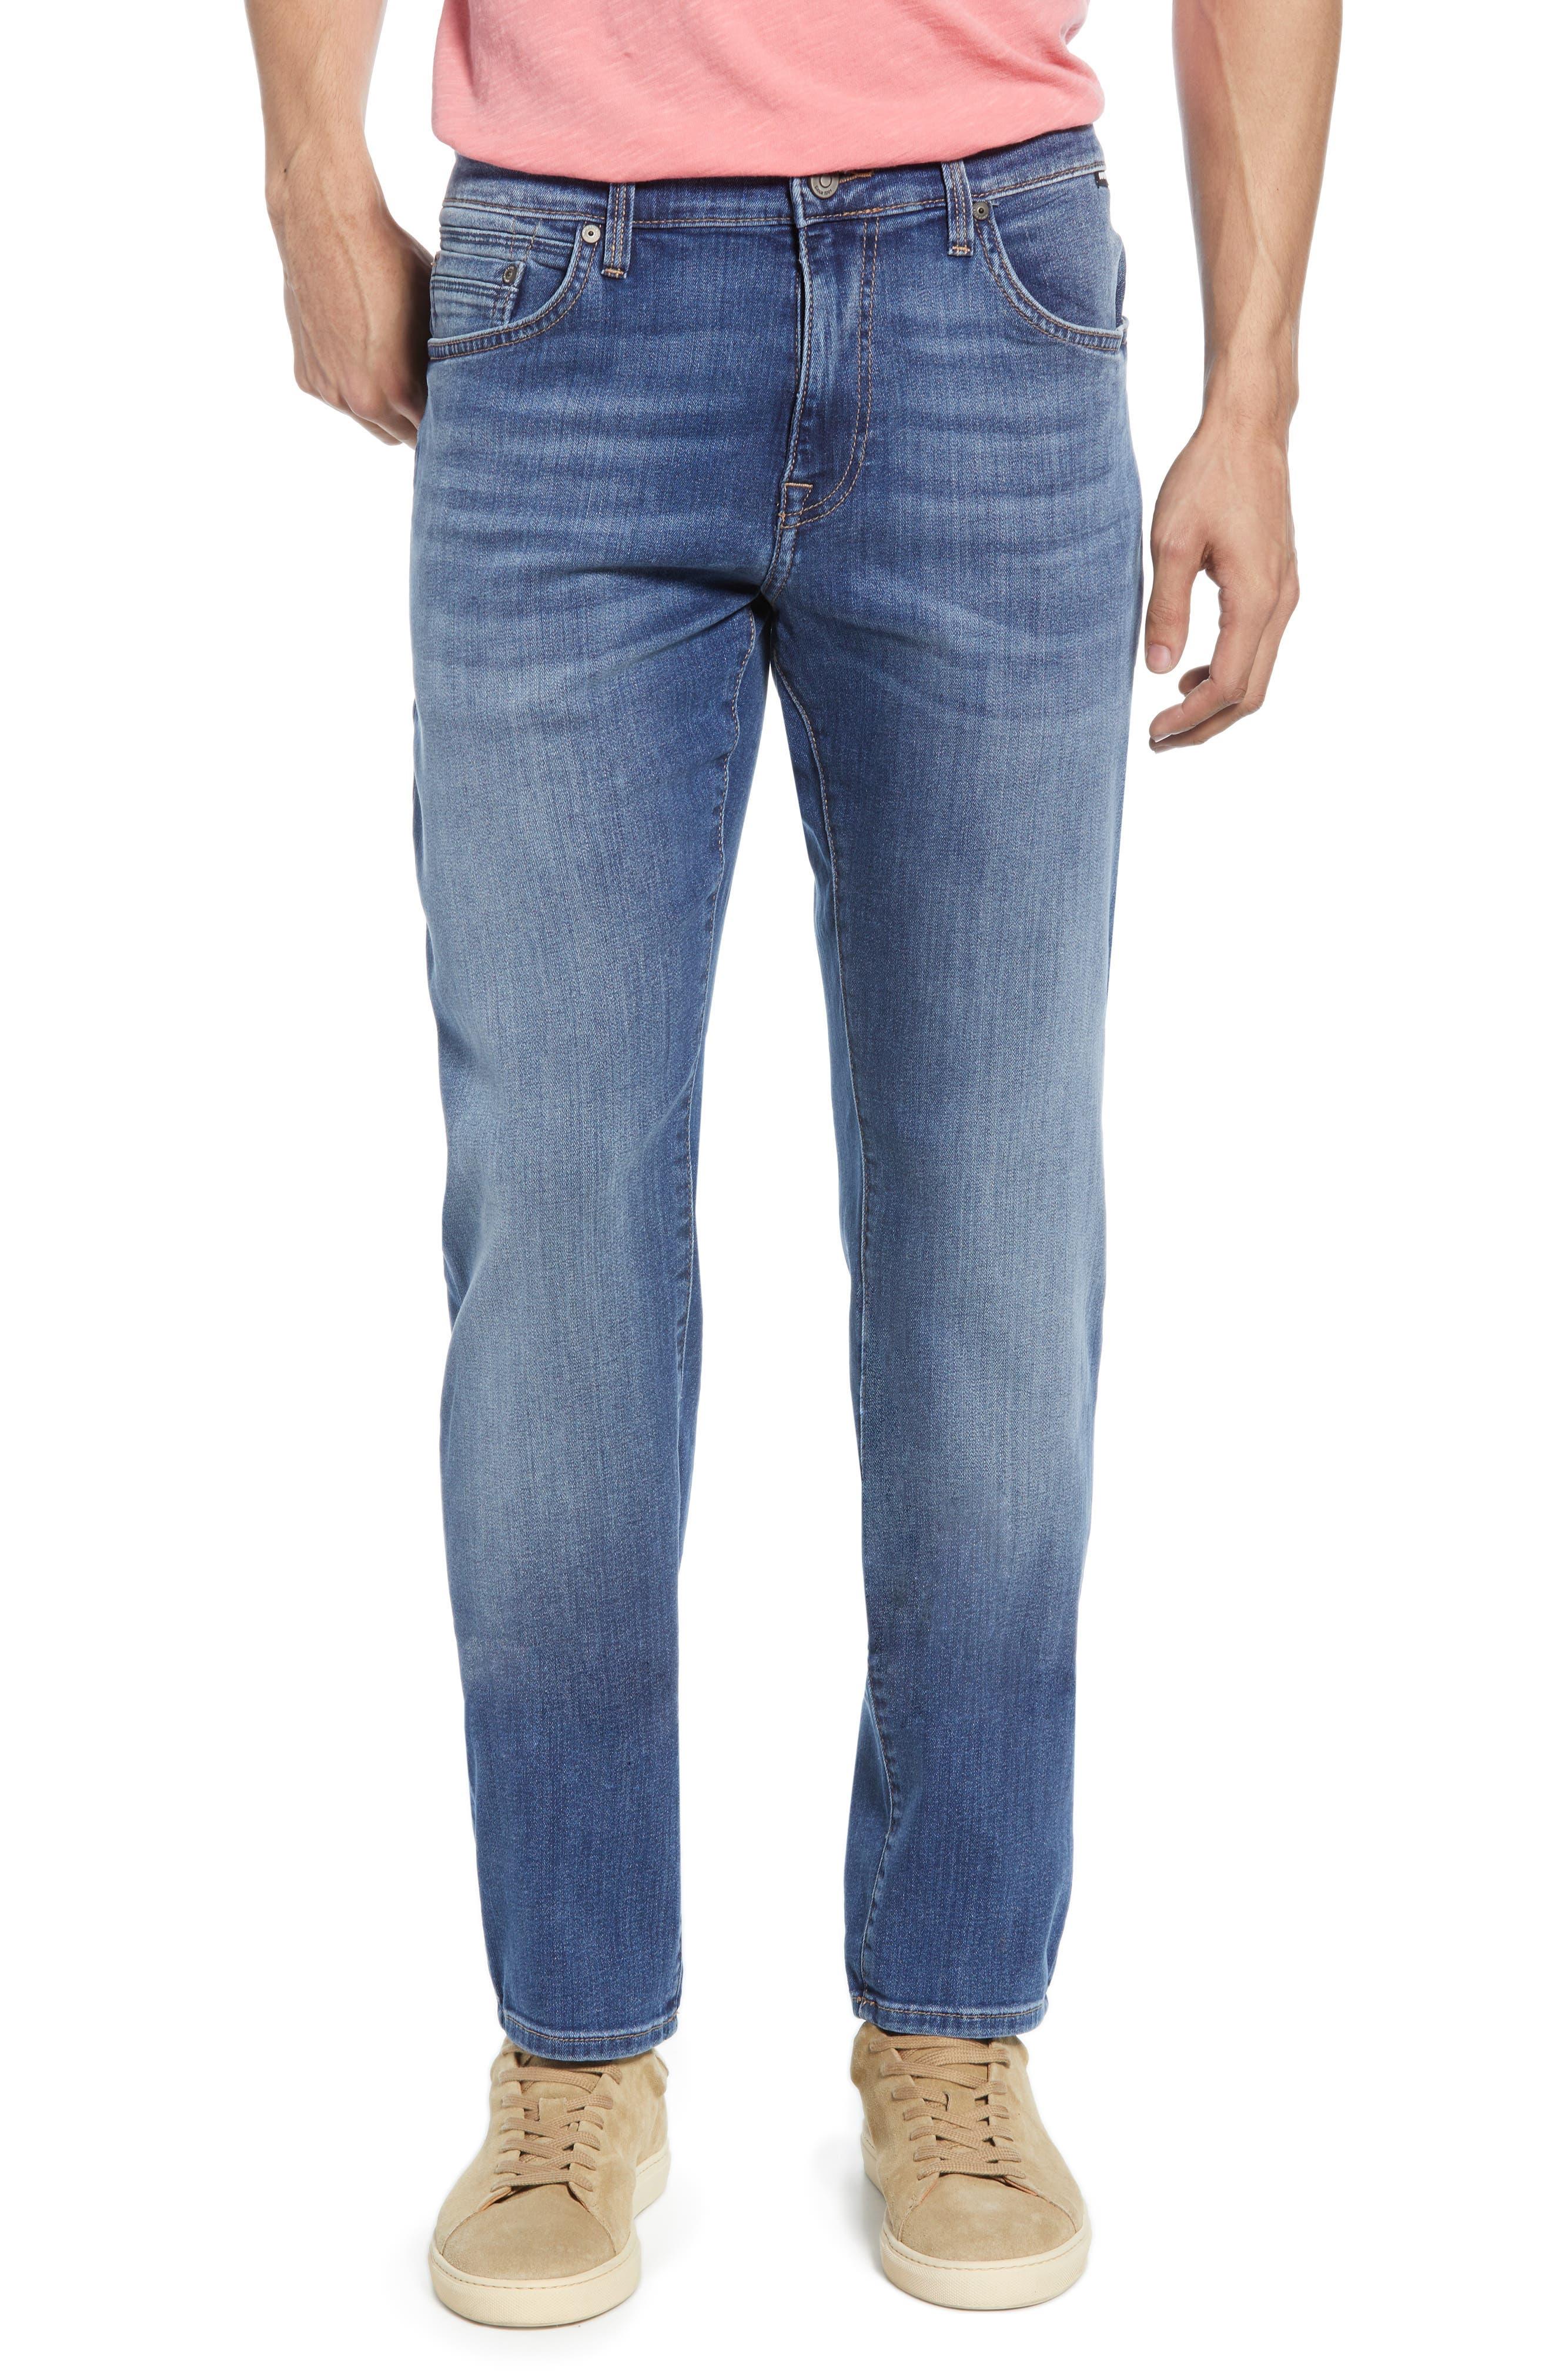 Jake Slim Fit Jeans